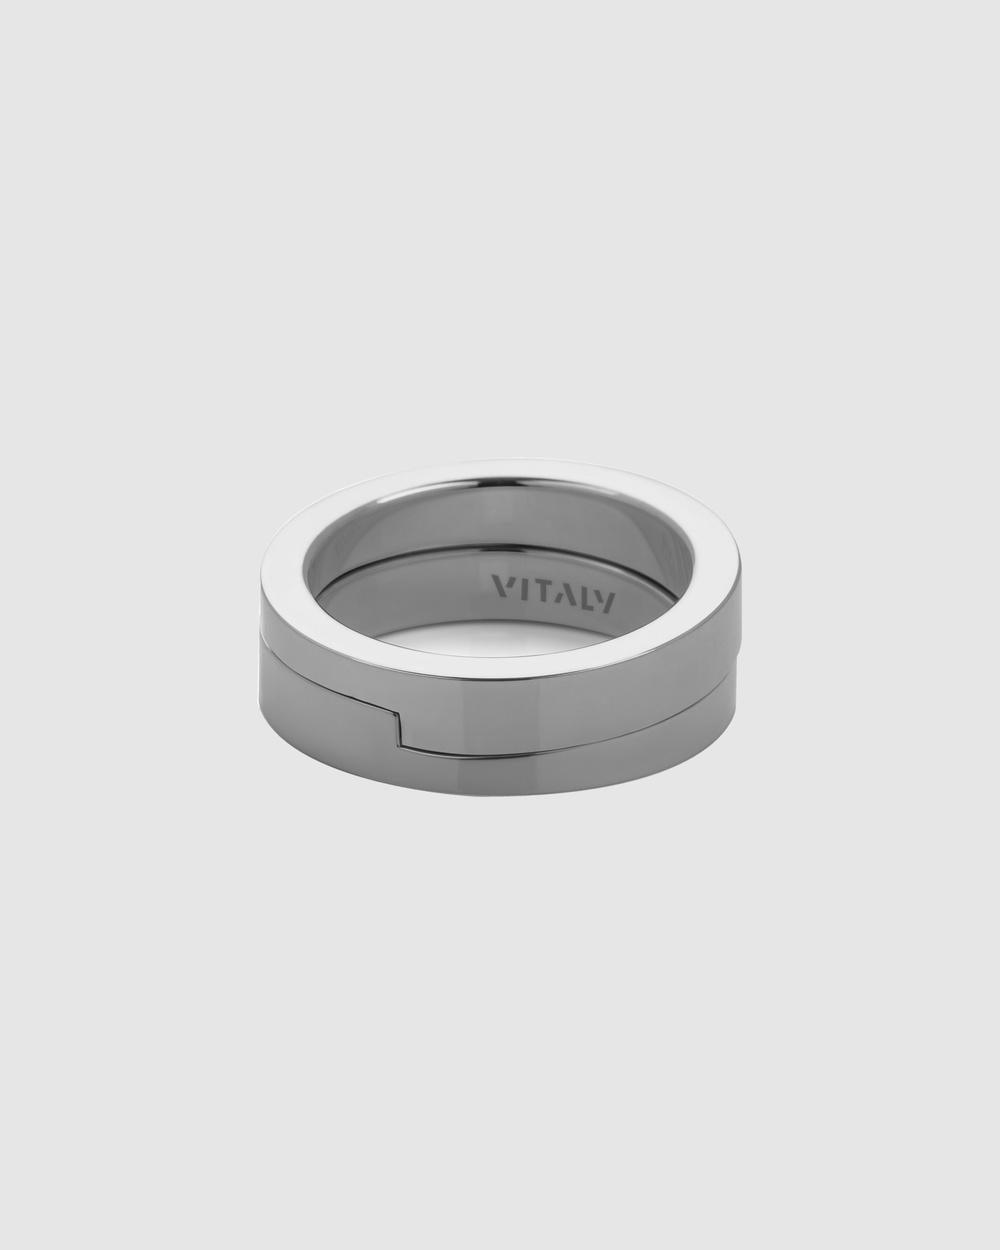 Vitaly Gridlock Jewellery Stainless Steel